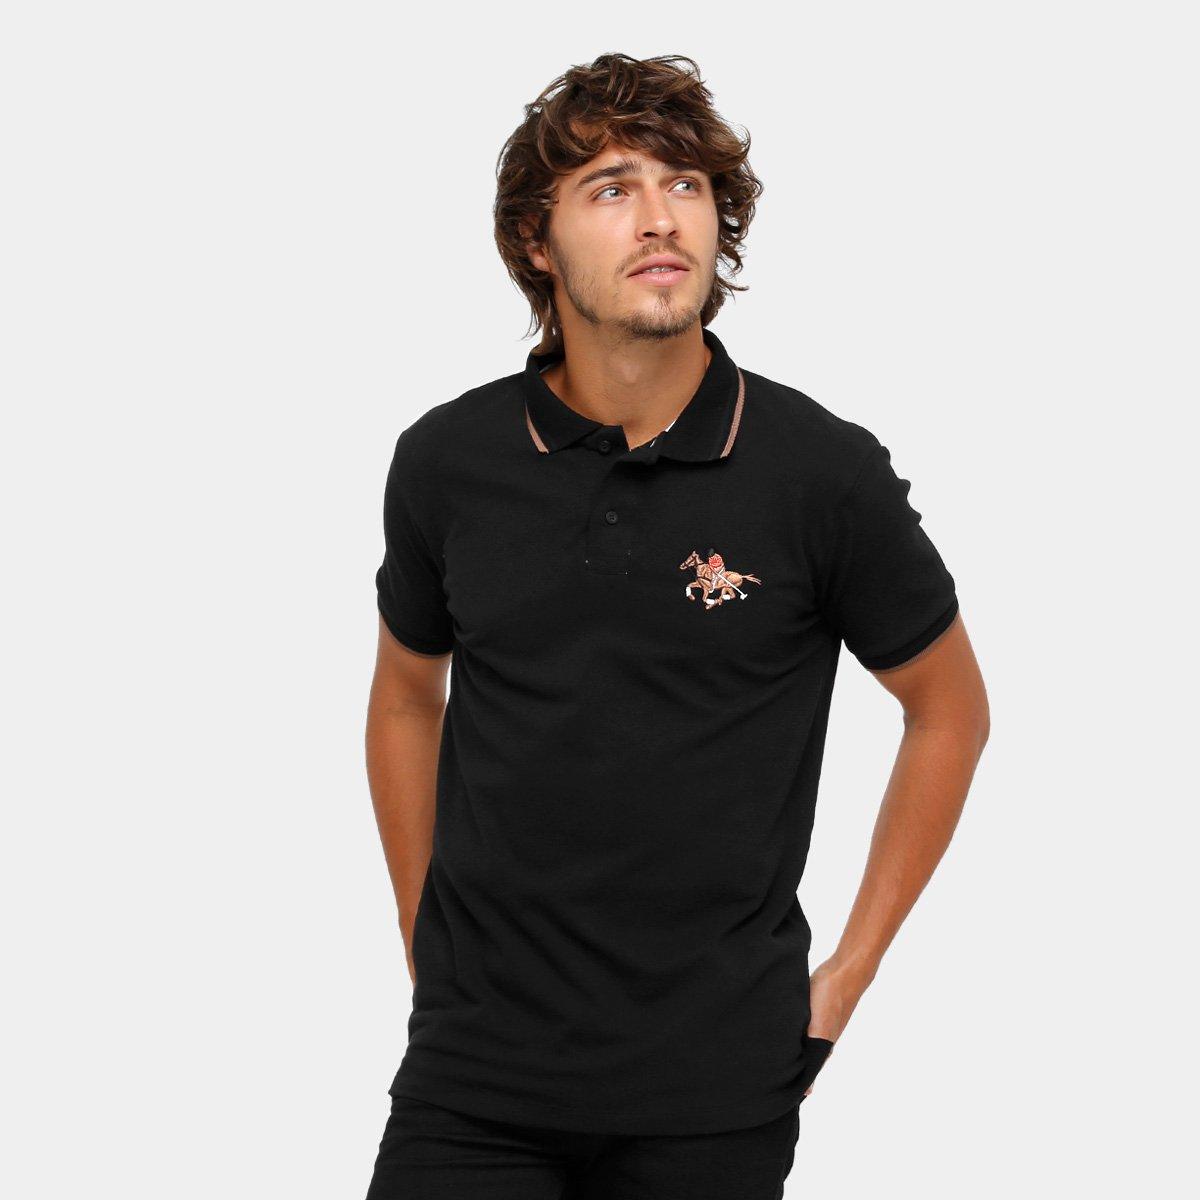 c016dbee4 Camisa Polo RG 518 Malha Frisos Bordada Masculina